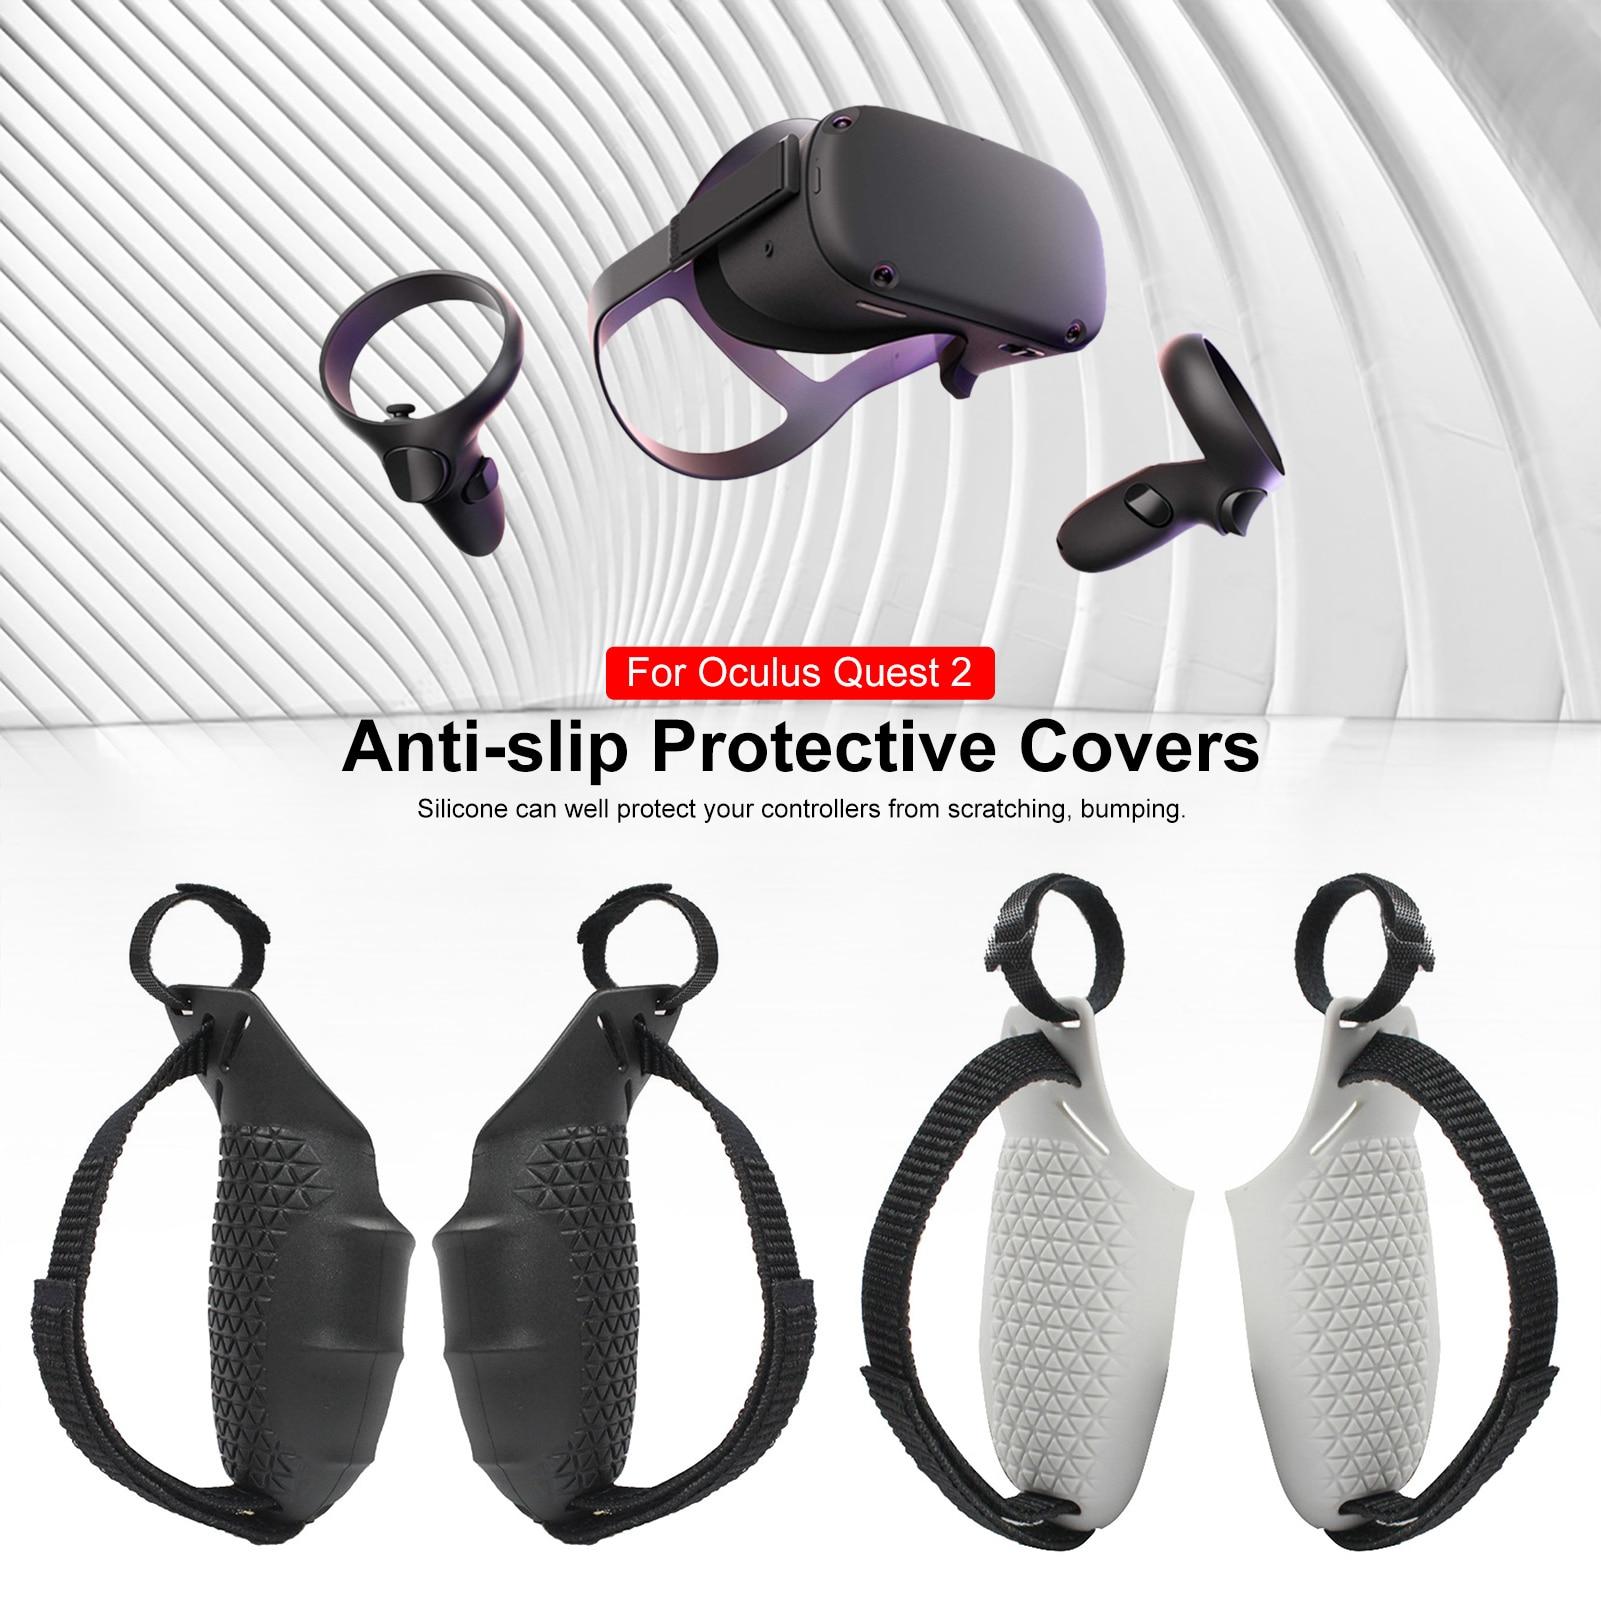 Suitable For Oculus Quest 2 VR Anti-drop Sweat-resistant Touch Controller Grip Cover Case controller adjustable knuckle straps for oculus quest rift s vr touch controller grip accessories